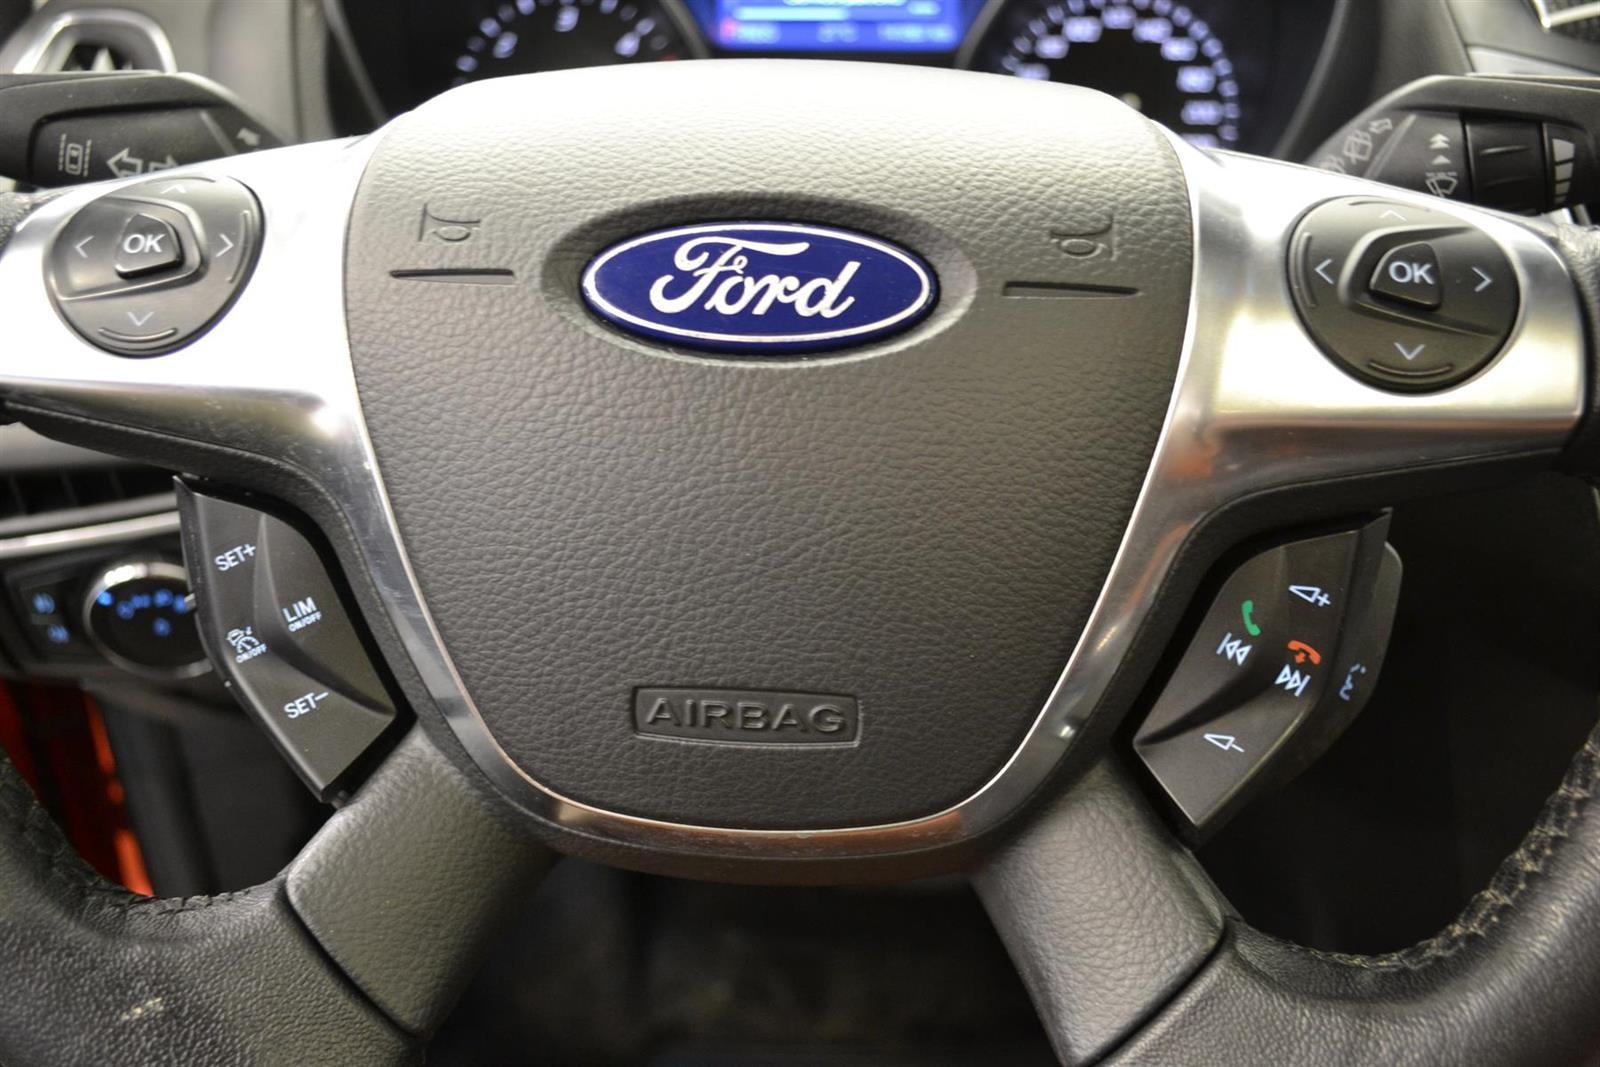 Ford Focus Slide 11